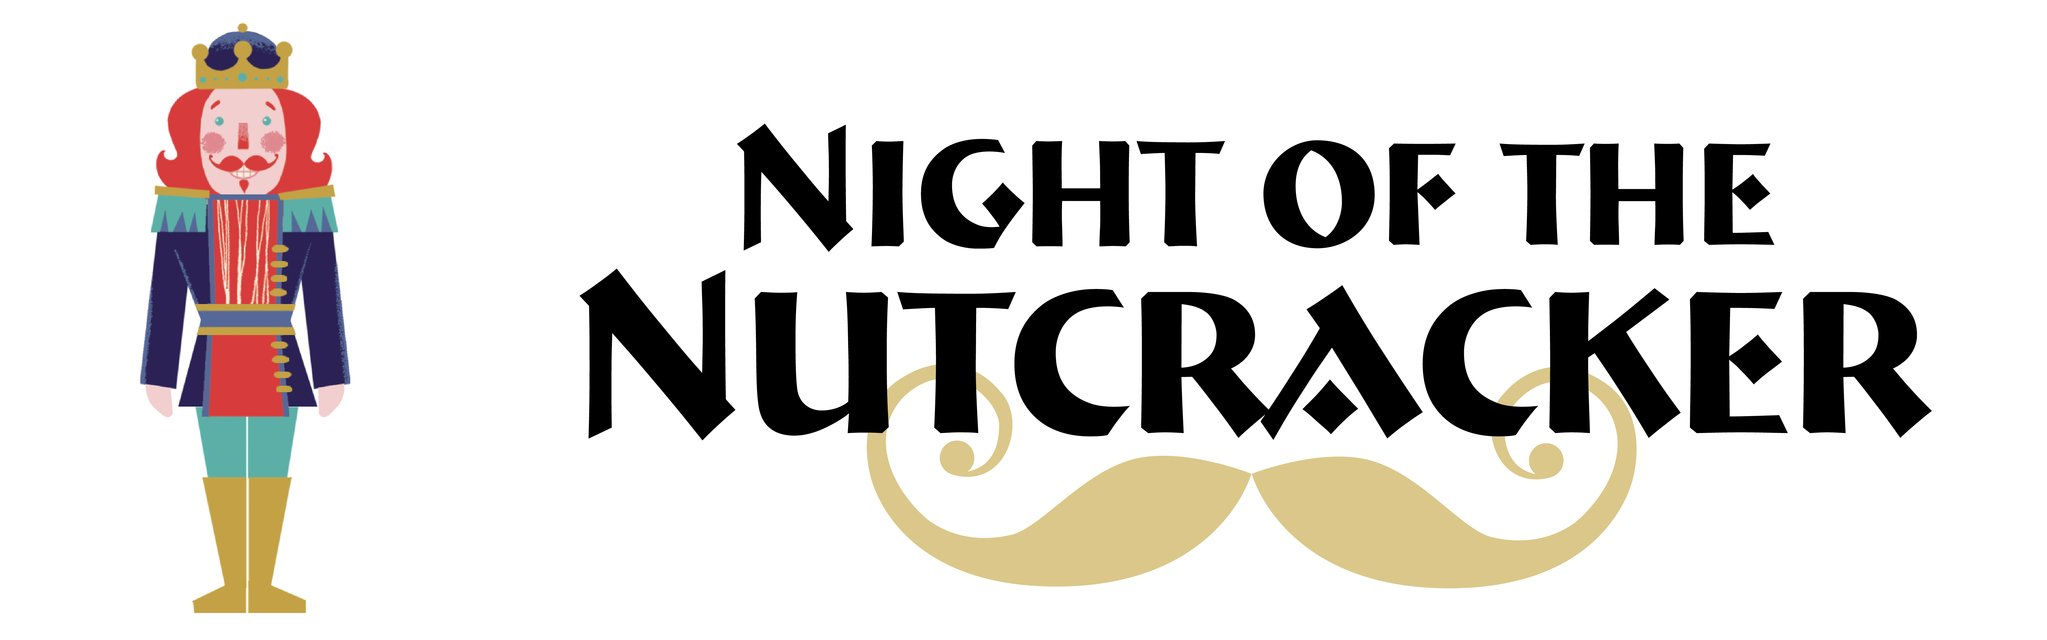 Night_of_the_Nutcrackers_2048x2048.jpg